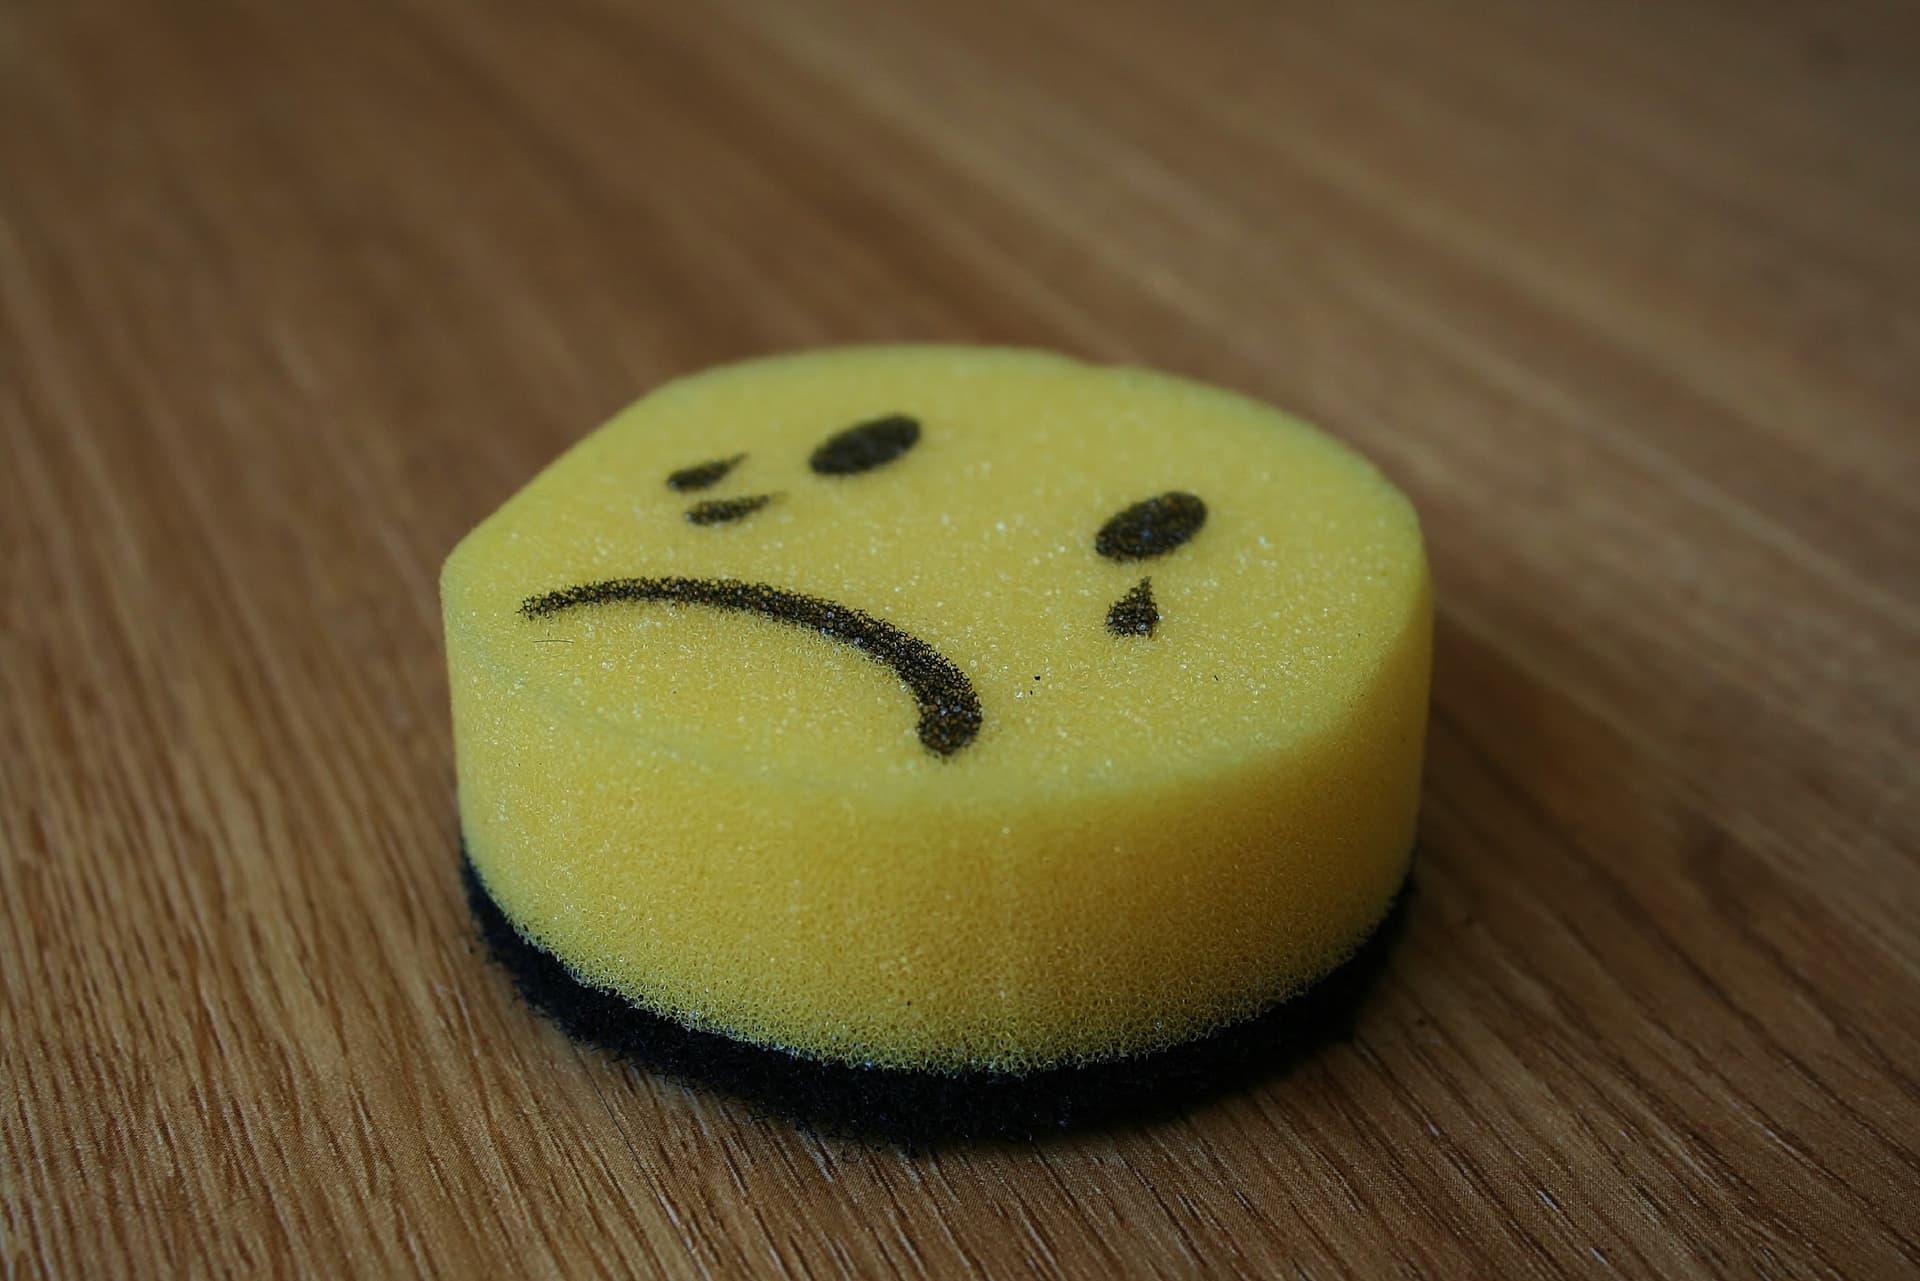 Circular sponge with the crying emoji drawn on it